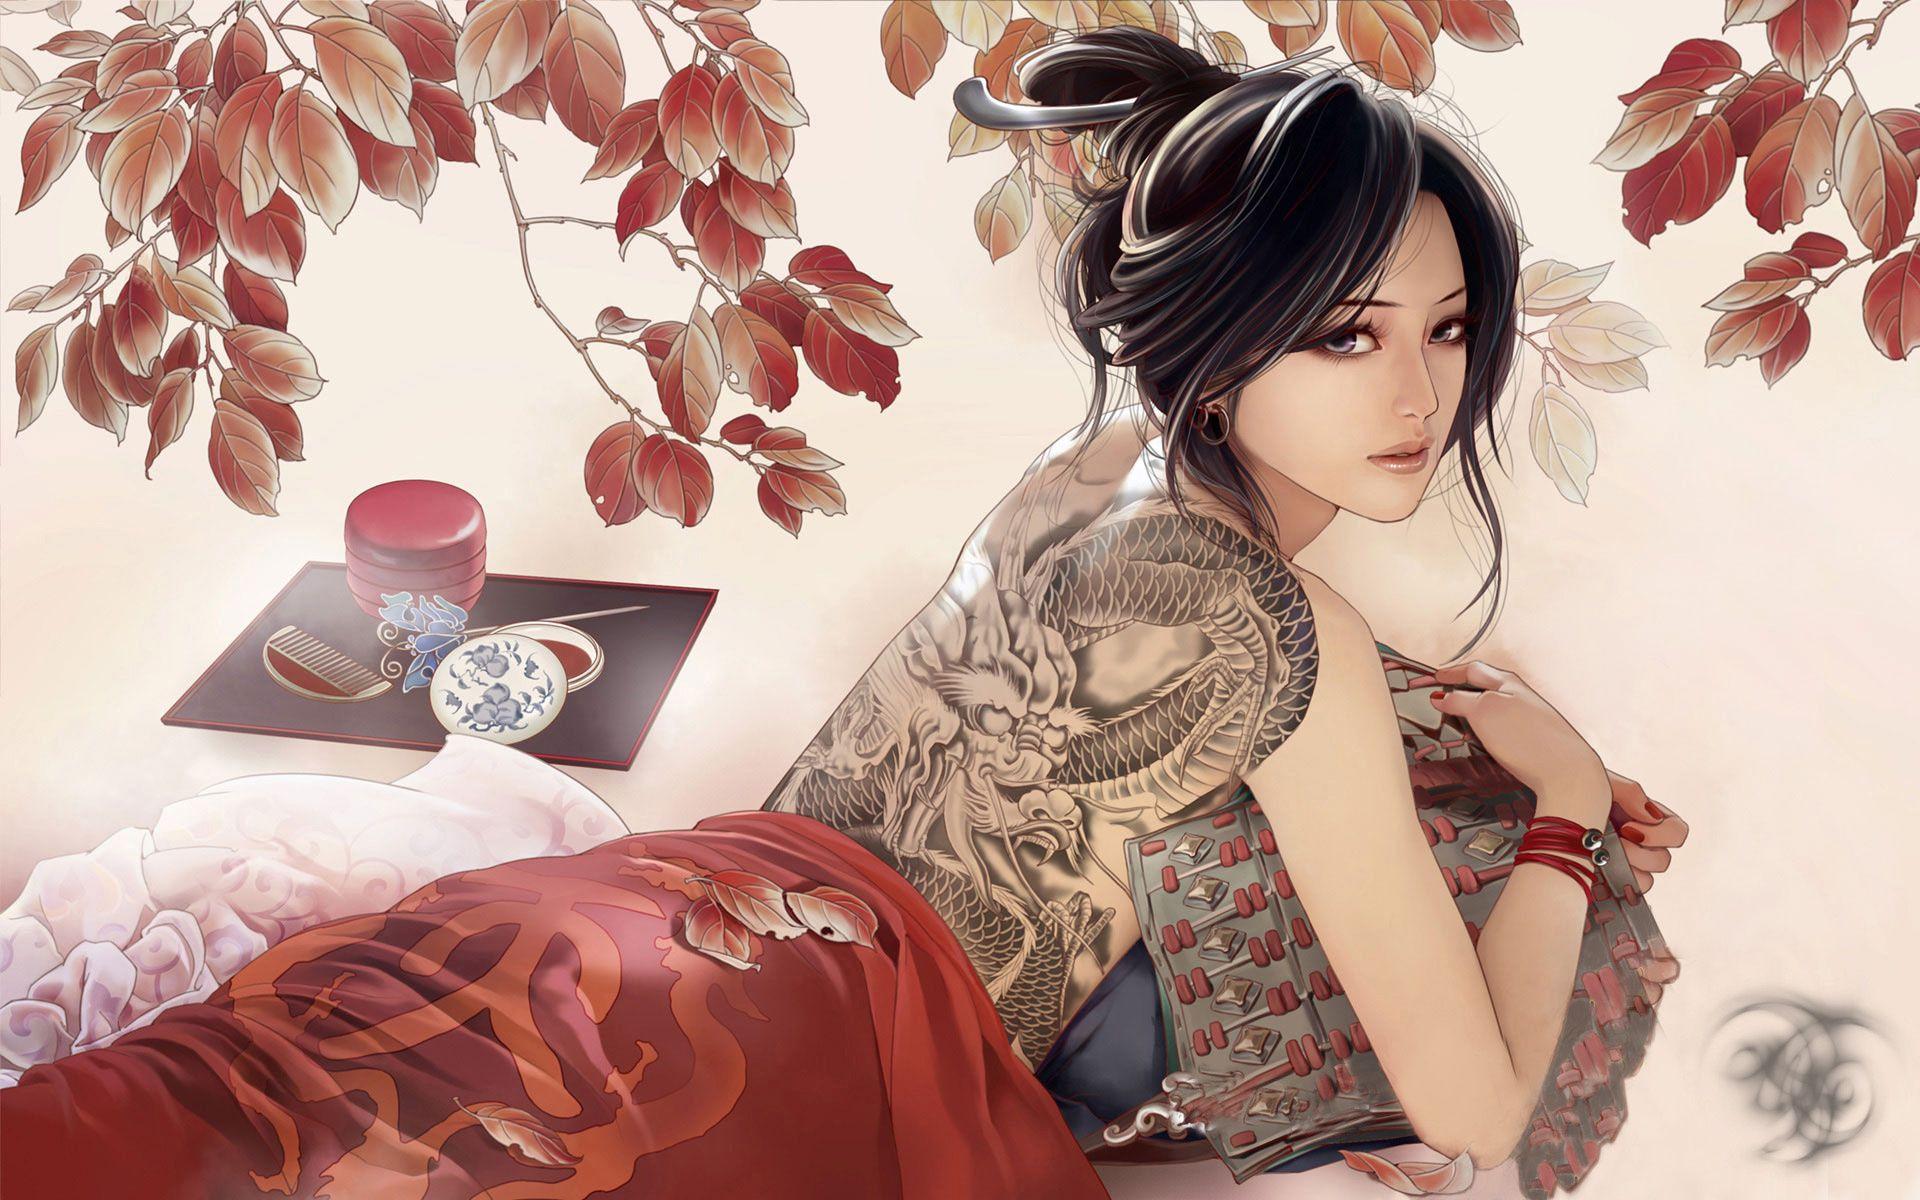 Tattooed Japanese Women Wallpaper Girl Tattoos Dragon Desktop